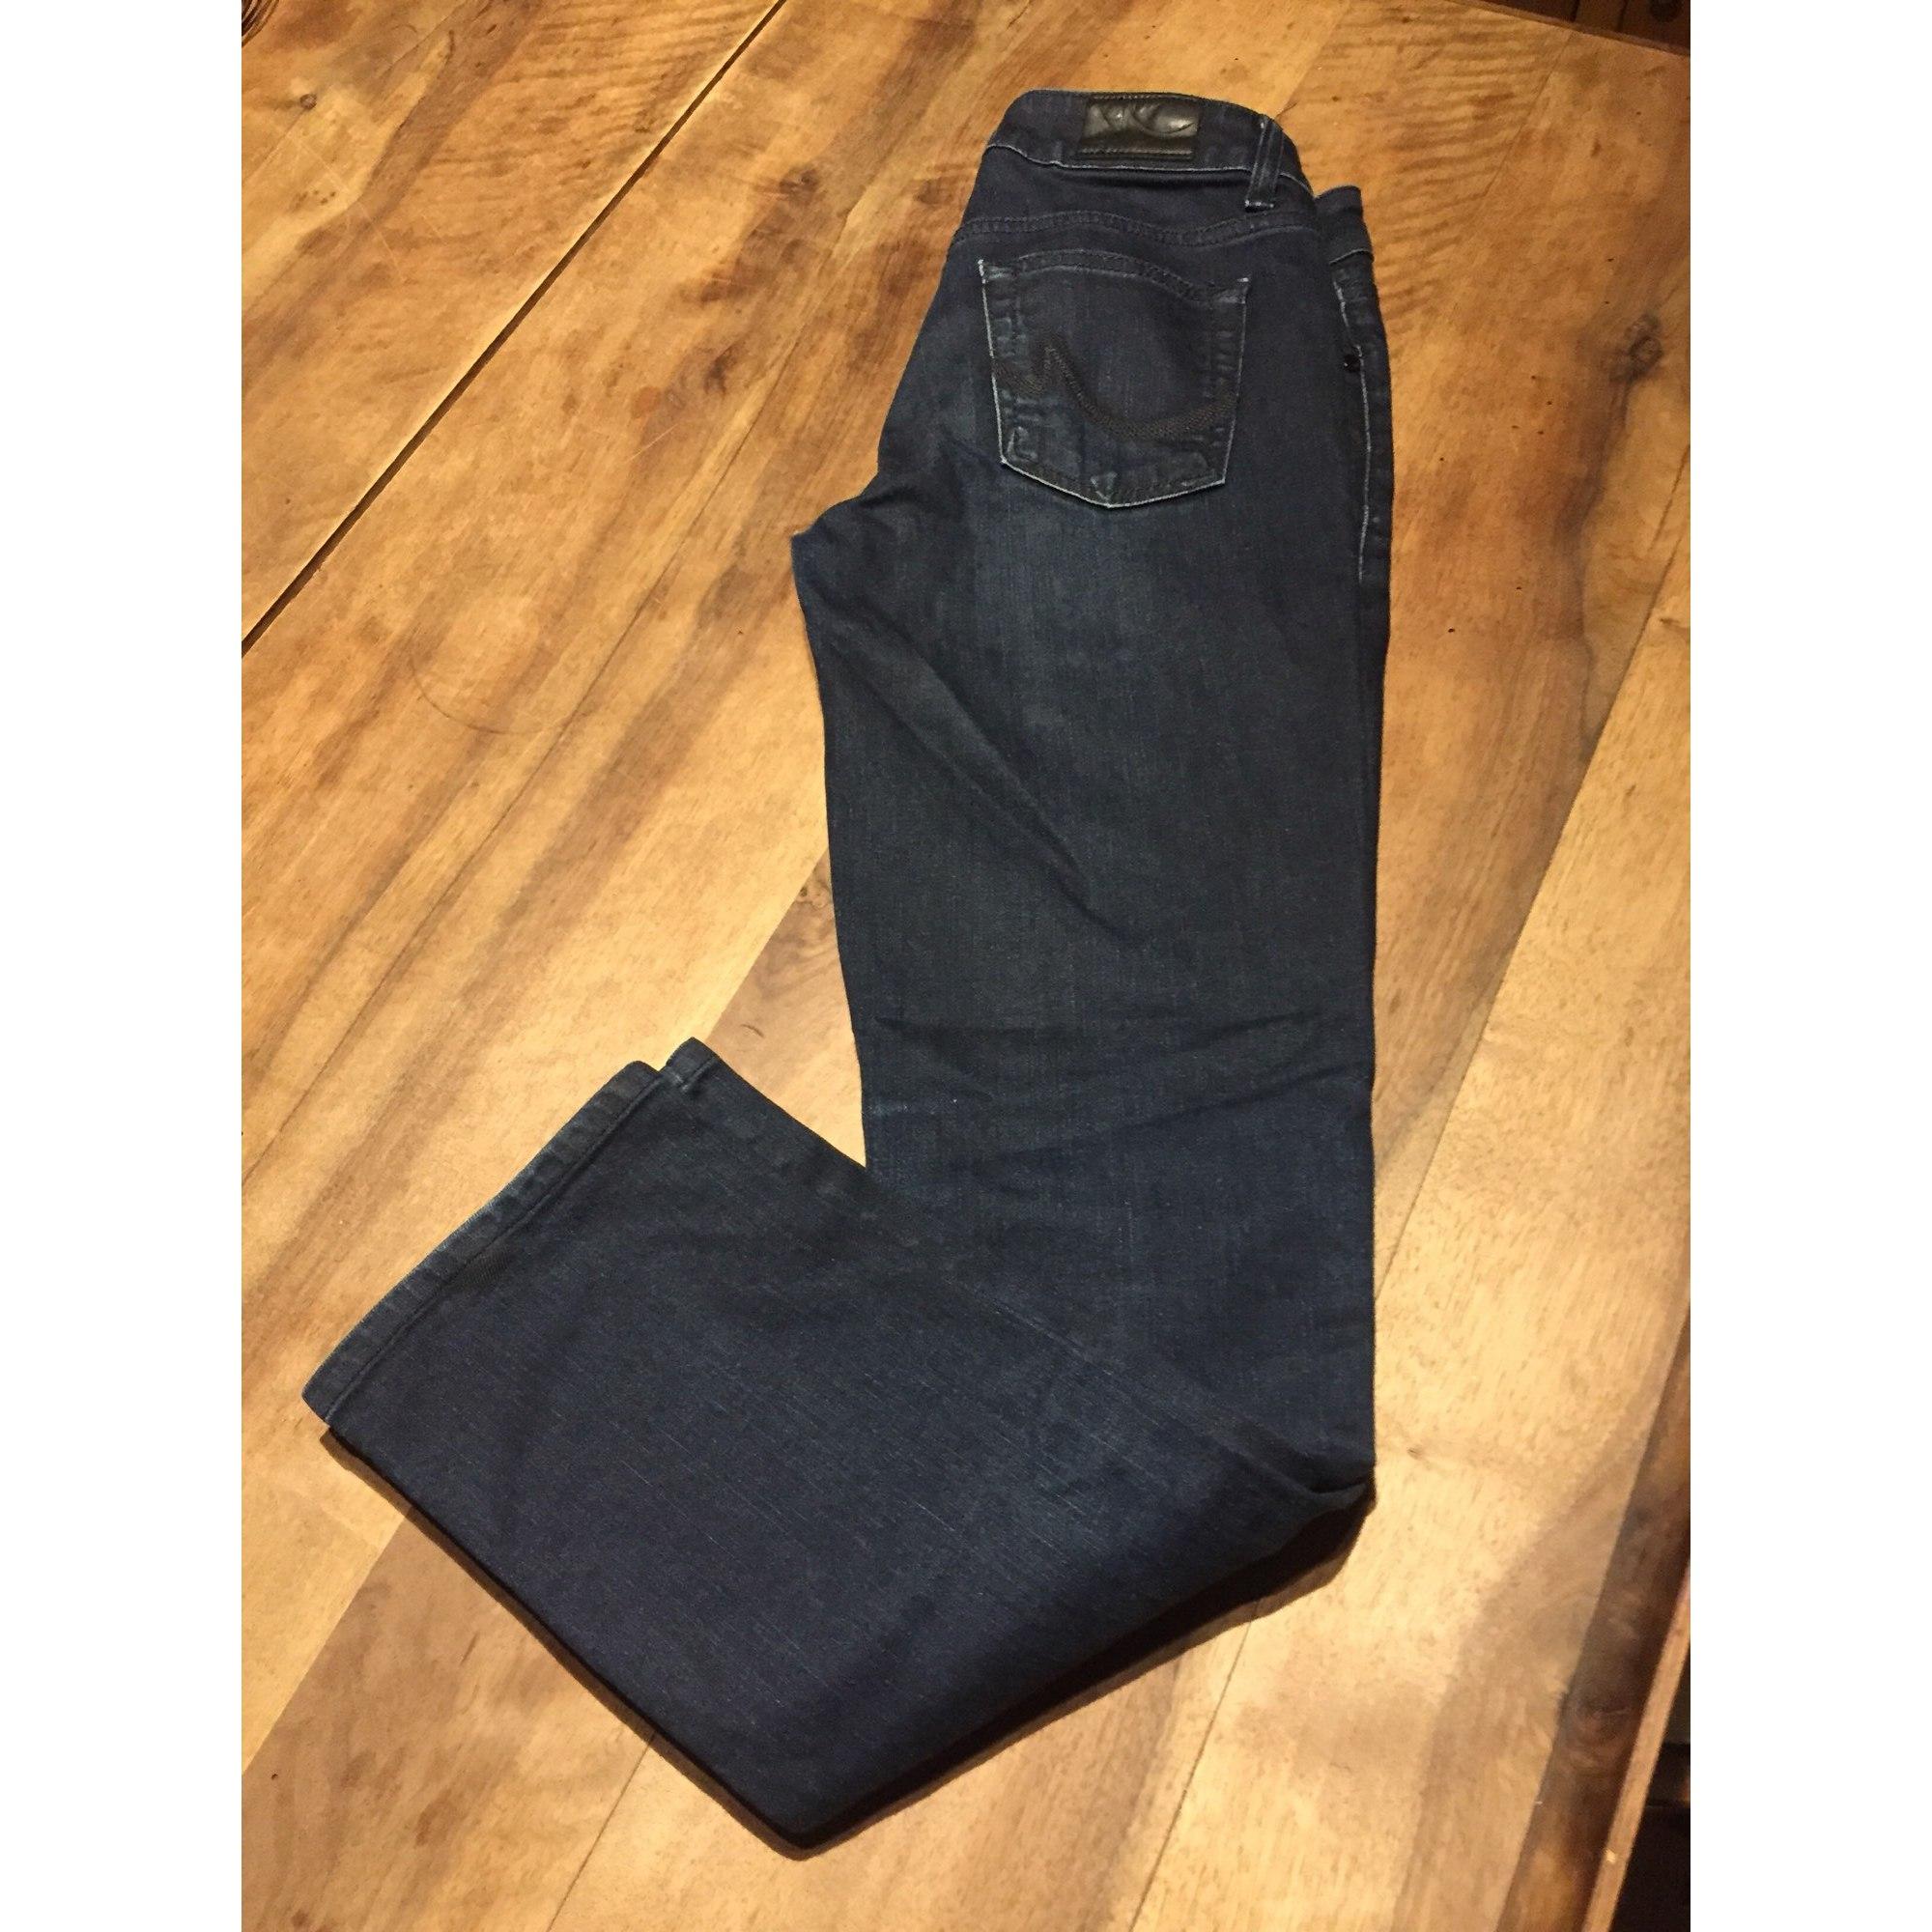 Straight Leg Pants LTB Blue, navy, turquoise